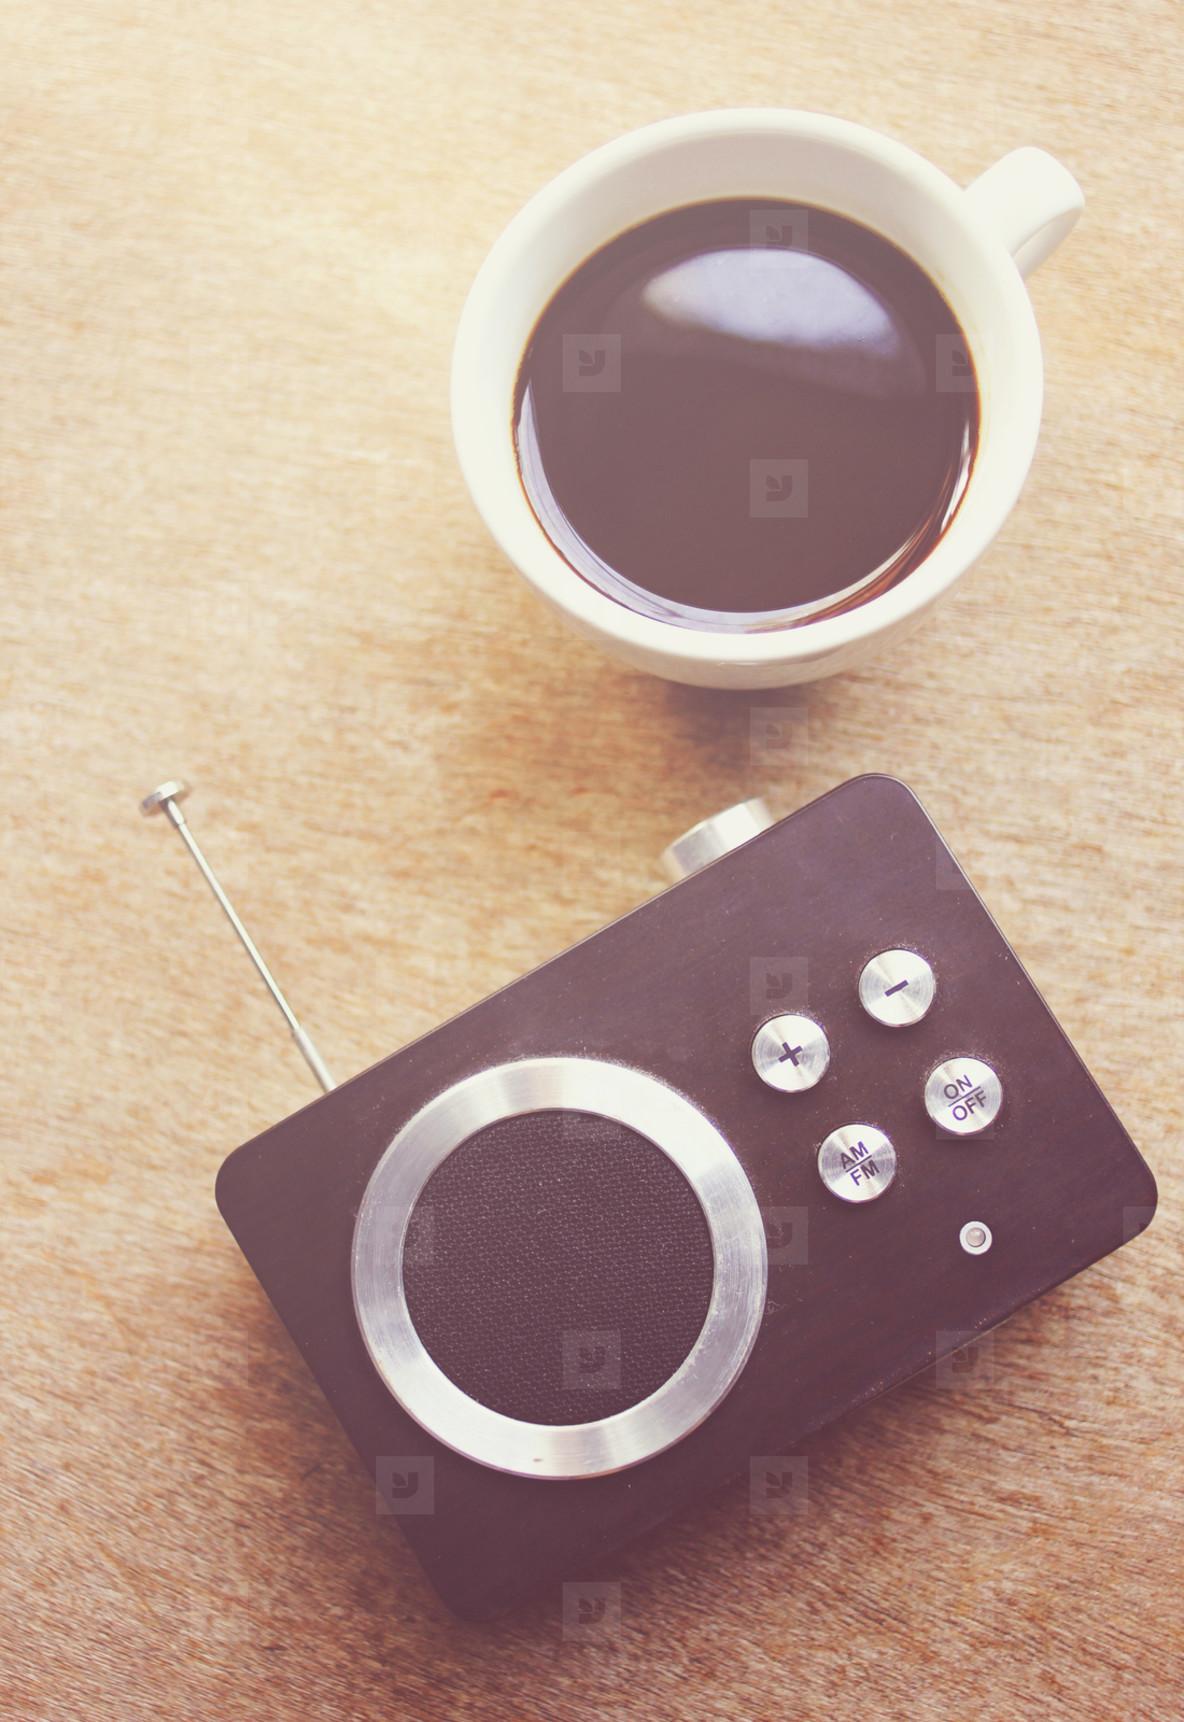 Retro radio and black coffee